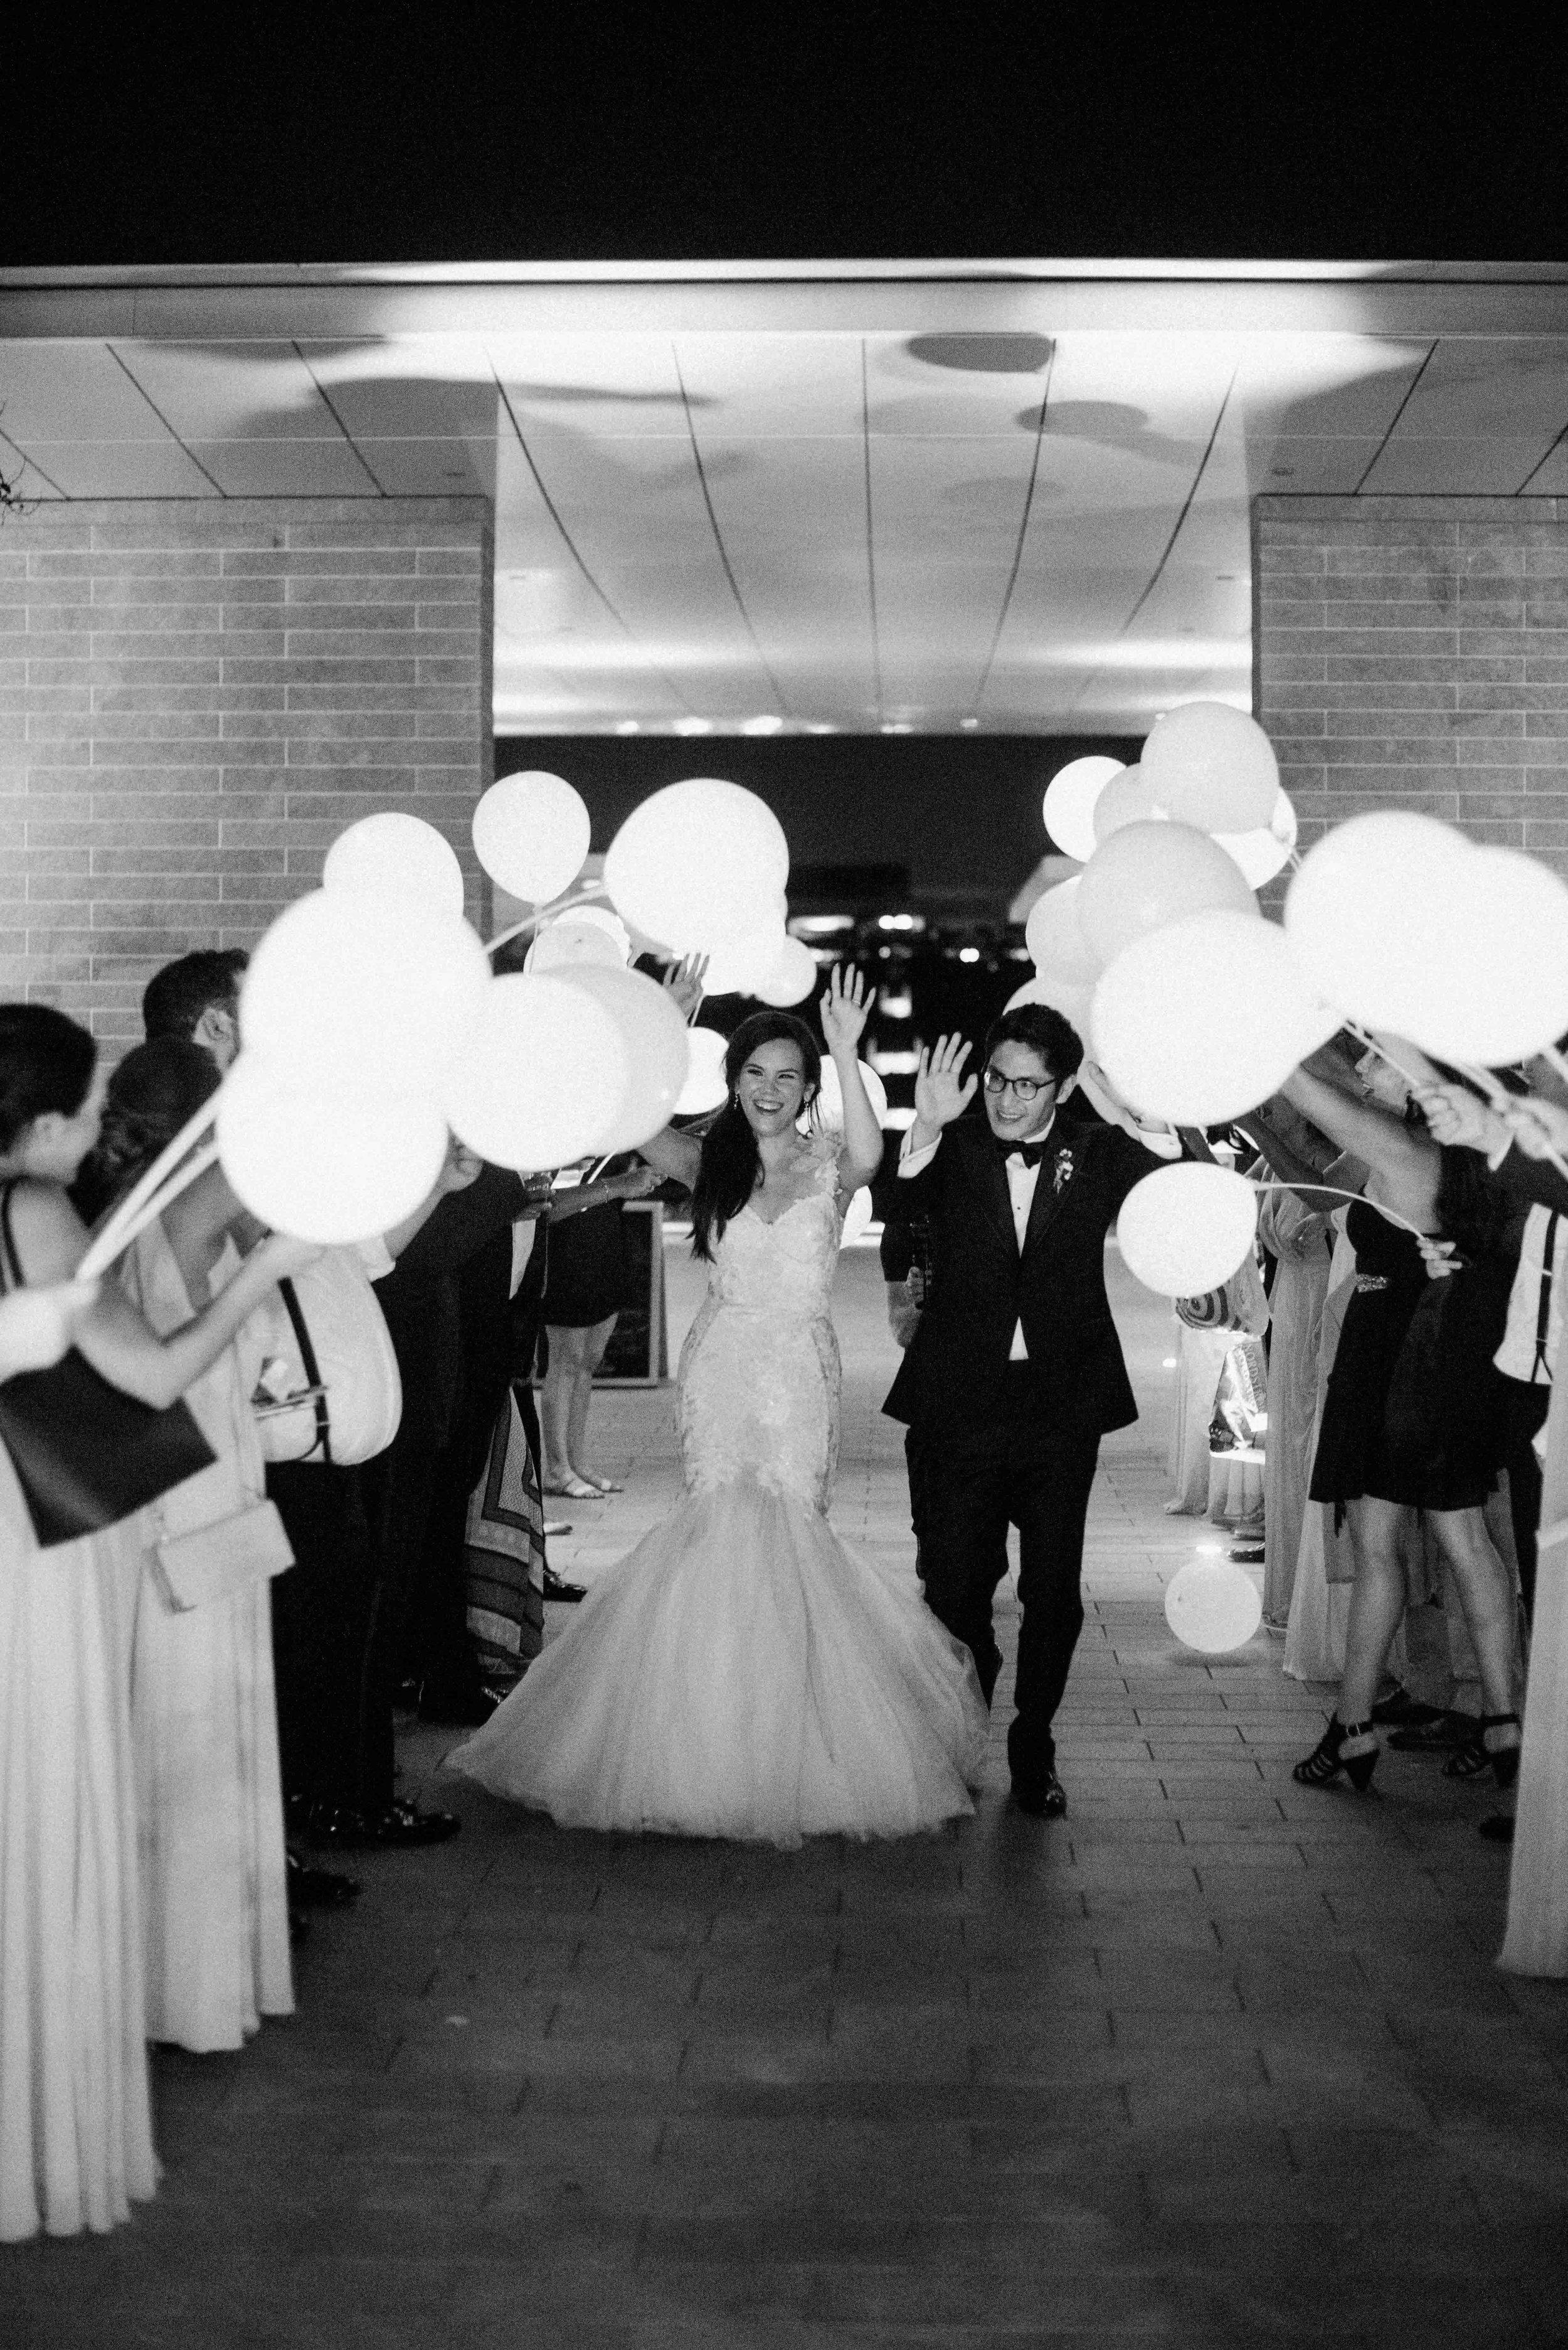 Martha-Stewart-Wedding-Dana-Fernandez-Photography-Josh-Texas-Film-Houston-Wedding-Fine-Art-Photographer-McGovern-Centennial-Gardens-Top-Best-48.jpg